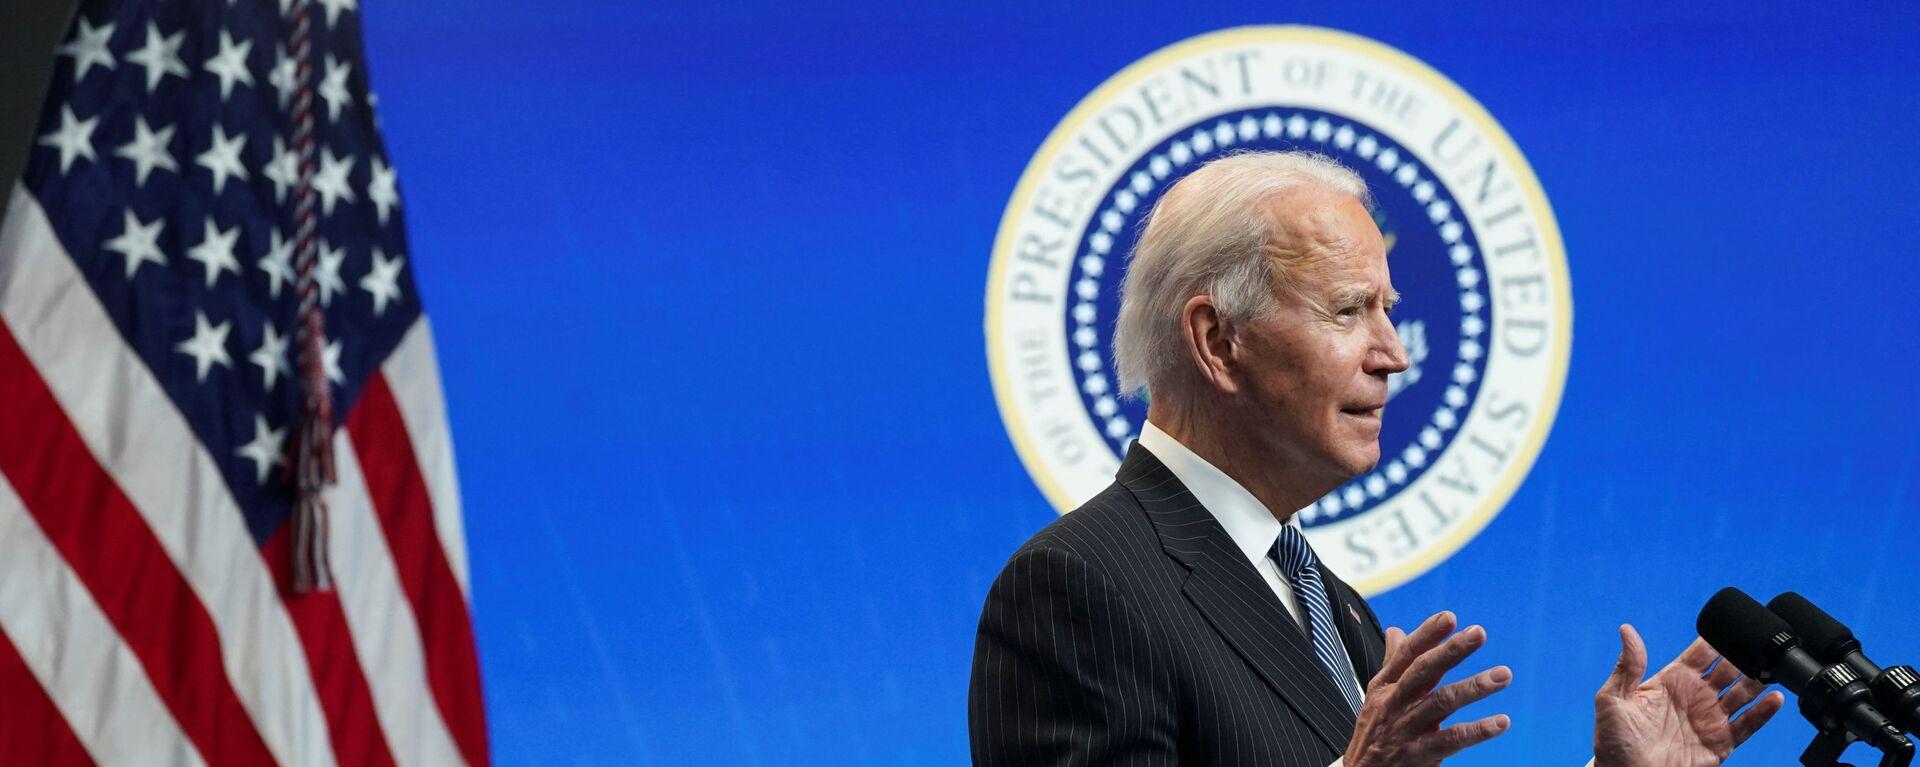 Joe Biden, presidente de EEUU - Sputnik Mundo, 1920, 13.02.2021